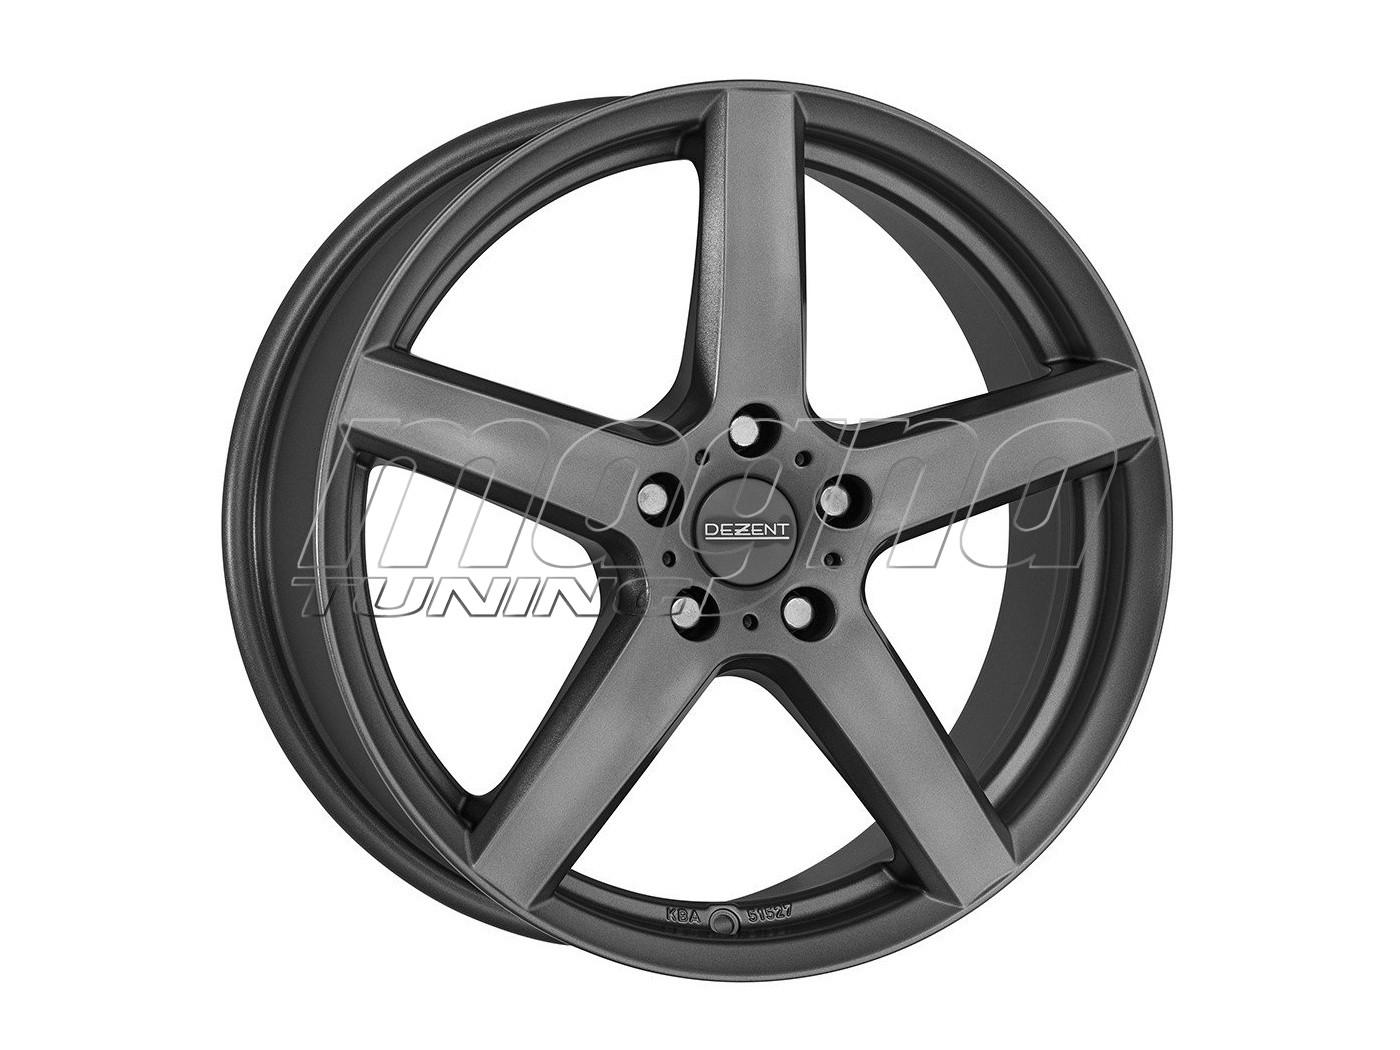 Dezent TY Graphite Wheel